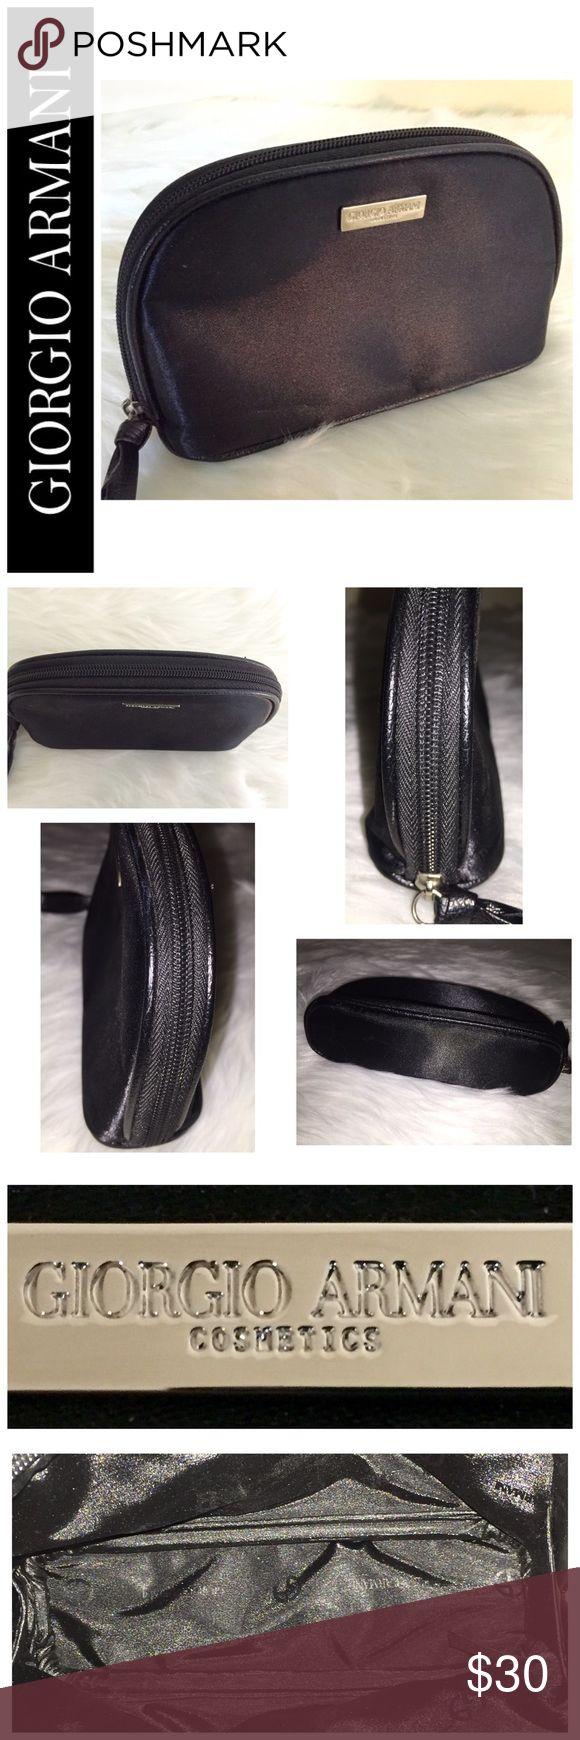 "Giorgio Armani Designer Cosmetic Bag Beautiful Giorgio Armani Designer Cosmetic Bag in Elegant Black Nylon, Approx. Size is 6 1/2""x 3 3/4""x 1 3/4"", NWOT Giorgio Armani Bags Cosmetic Bags & Cases"